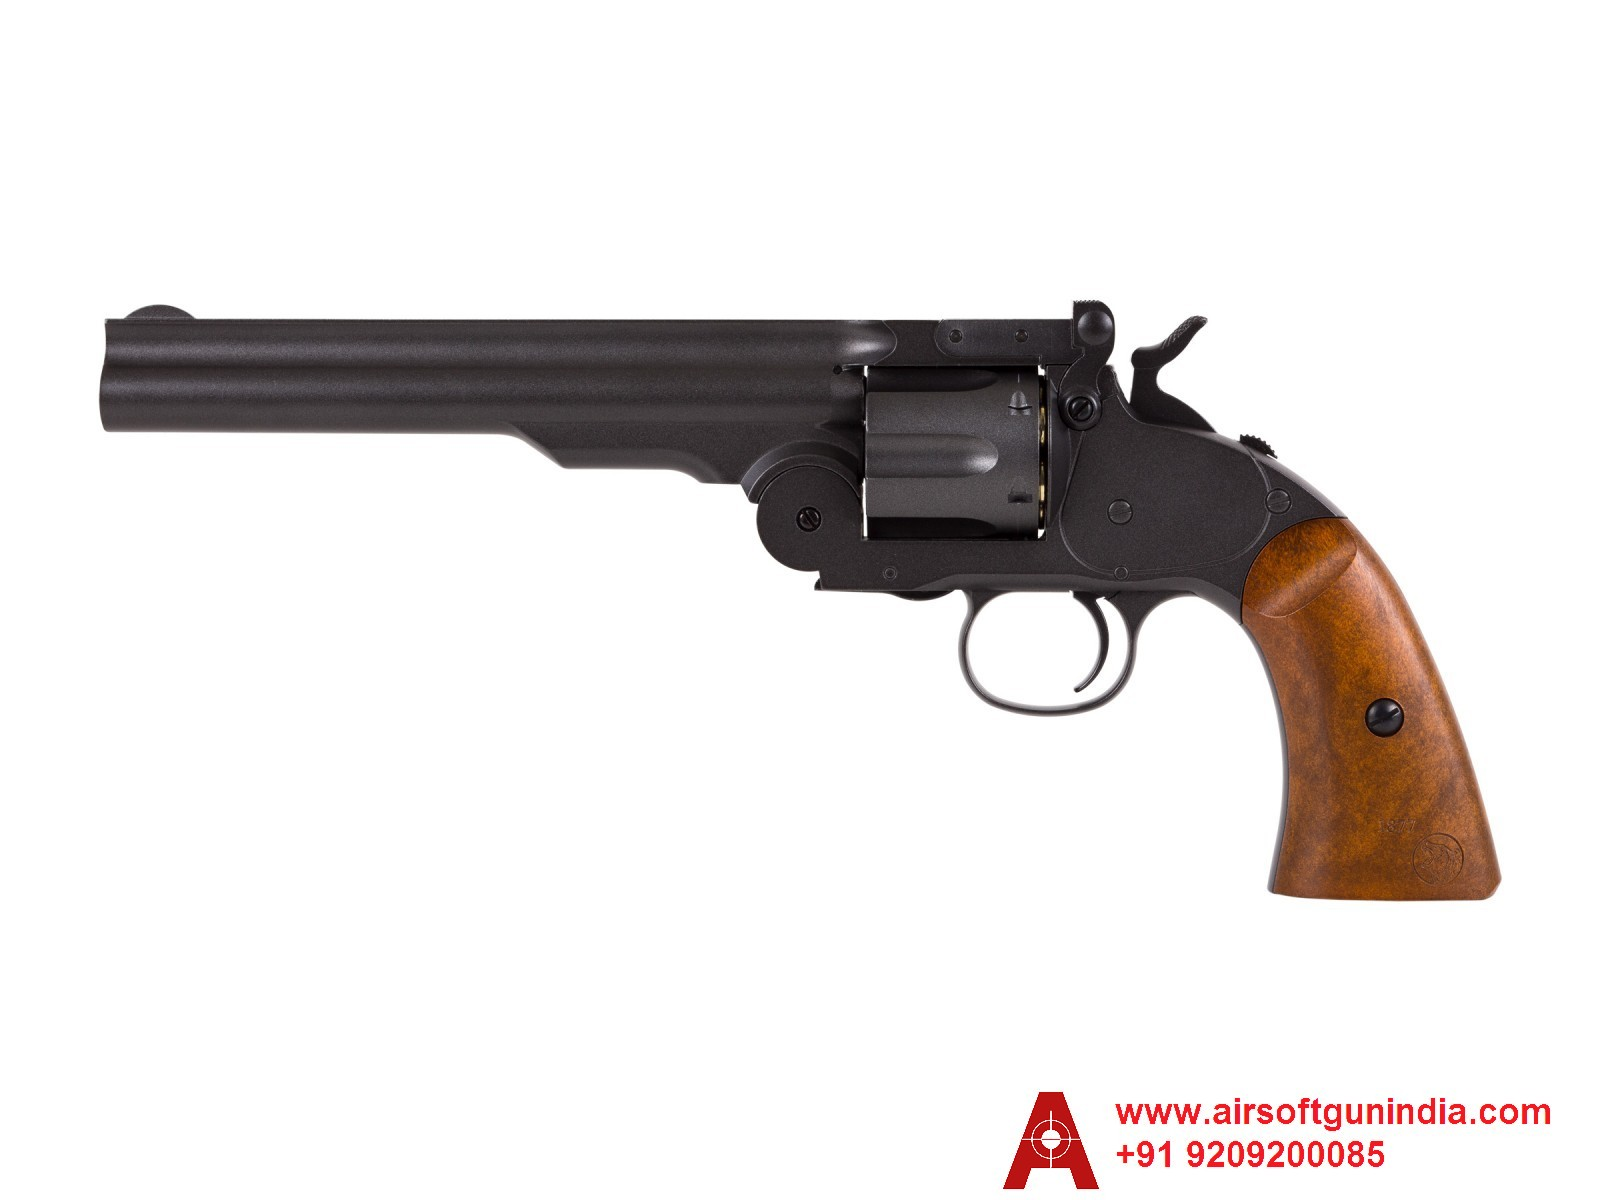 BARRA SCHOFIELD NO. 3 CO2 BB REVOLVER FULL BLACK BY AIRSOFT GUN INDIA